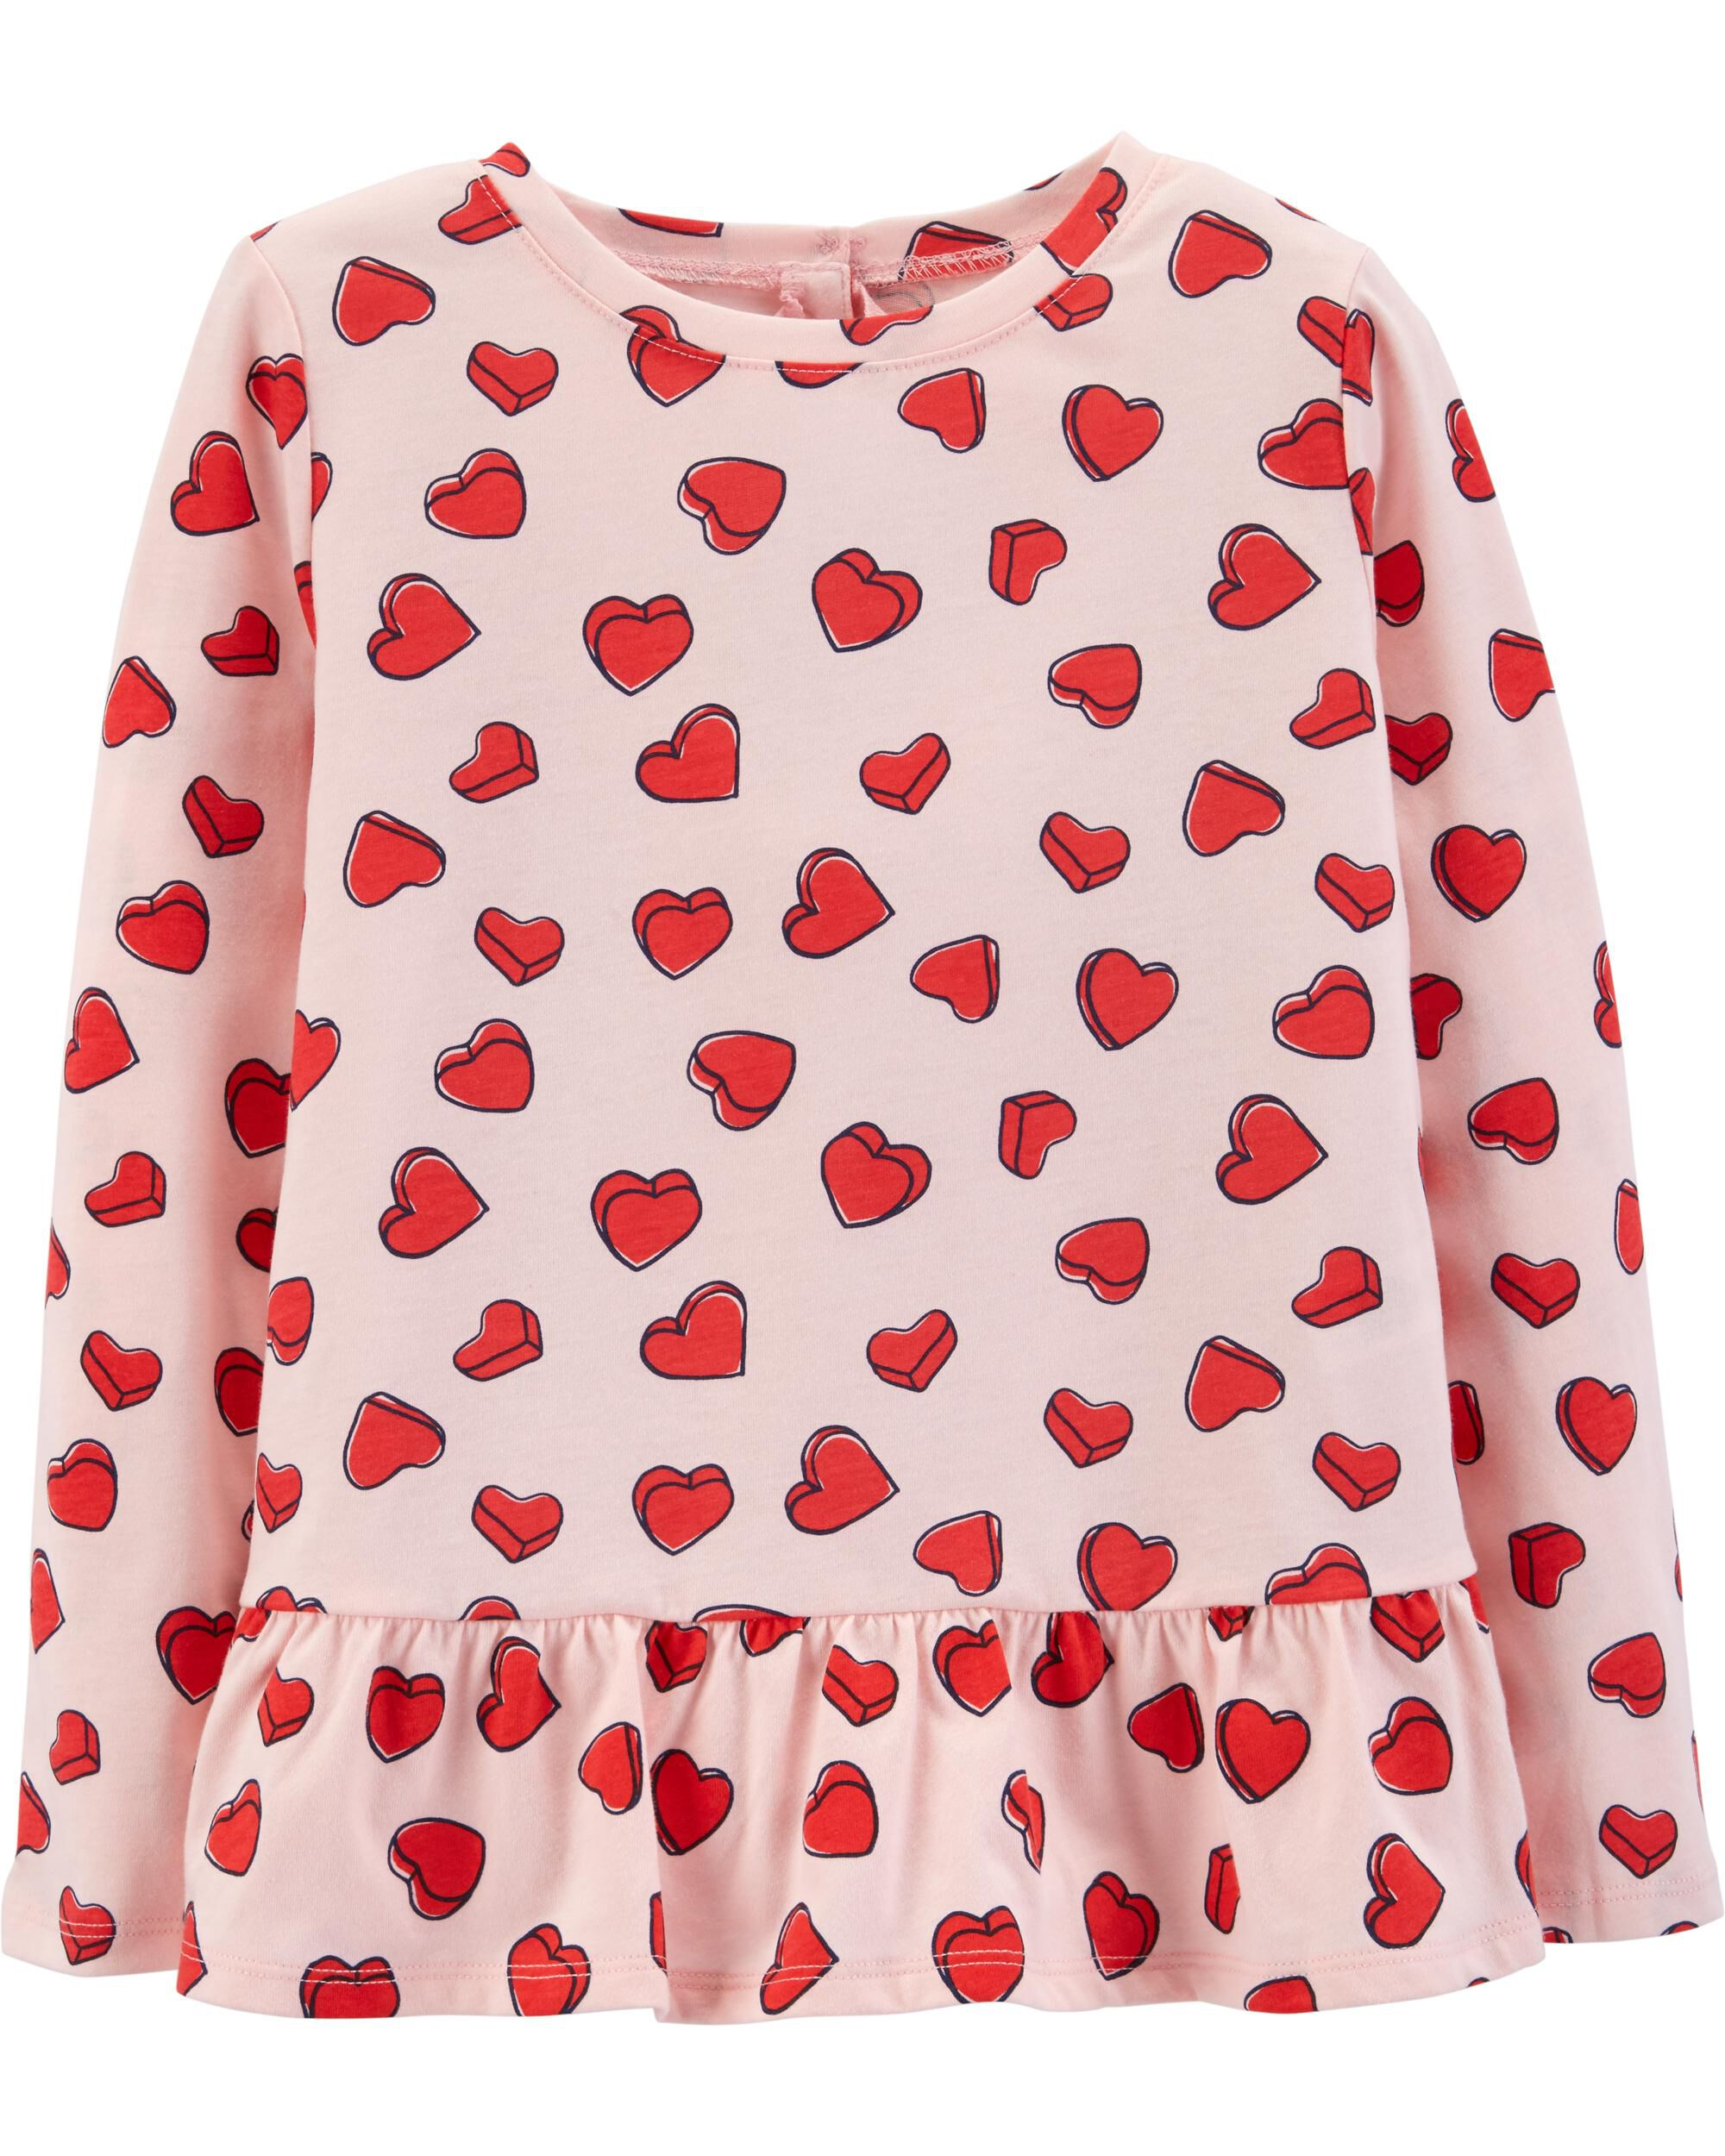 aa6c86cc Heart Peplum Top | Carters.com